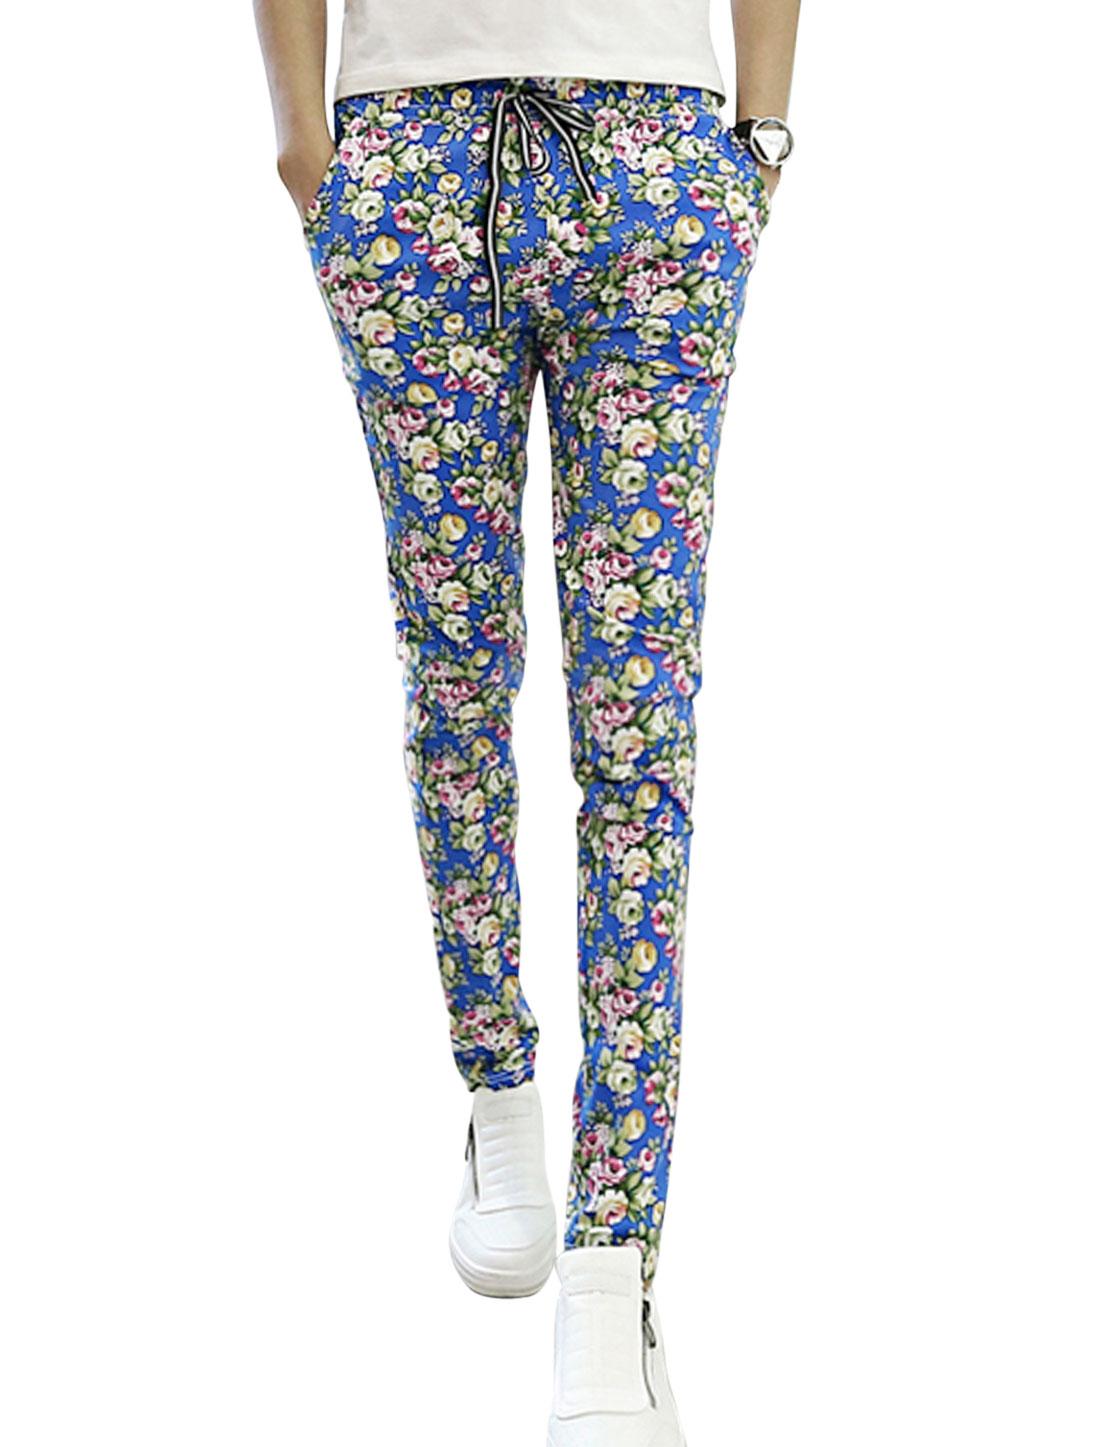 Man Royal Blue Fuchsia Mid Rise Floral Prints Elastic Waist Drawstring Pants W28